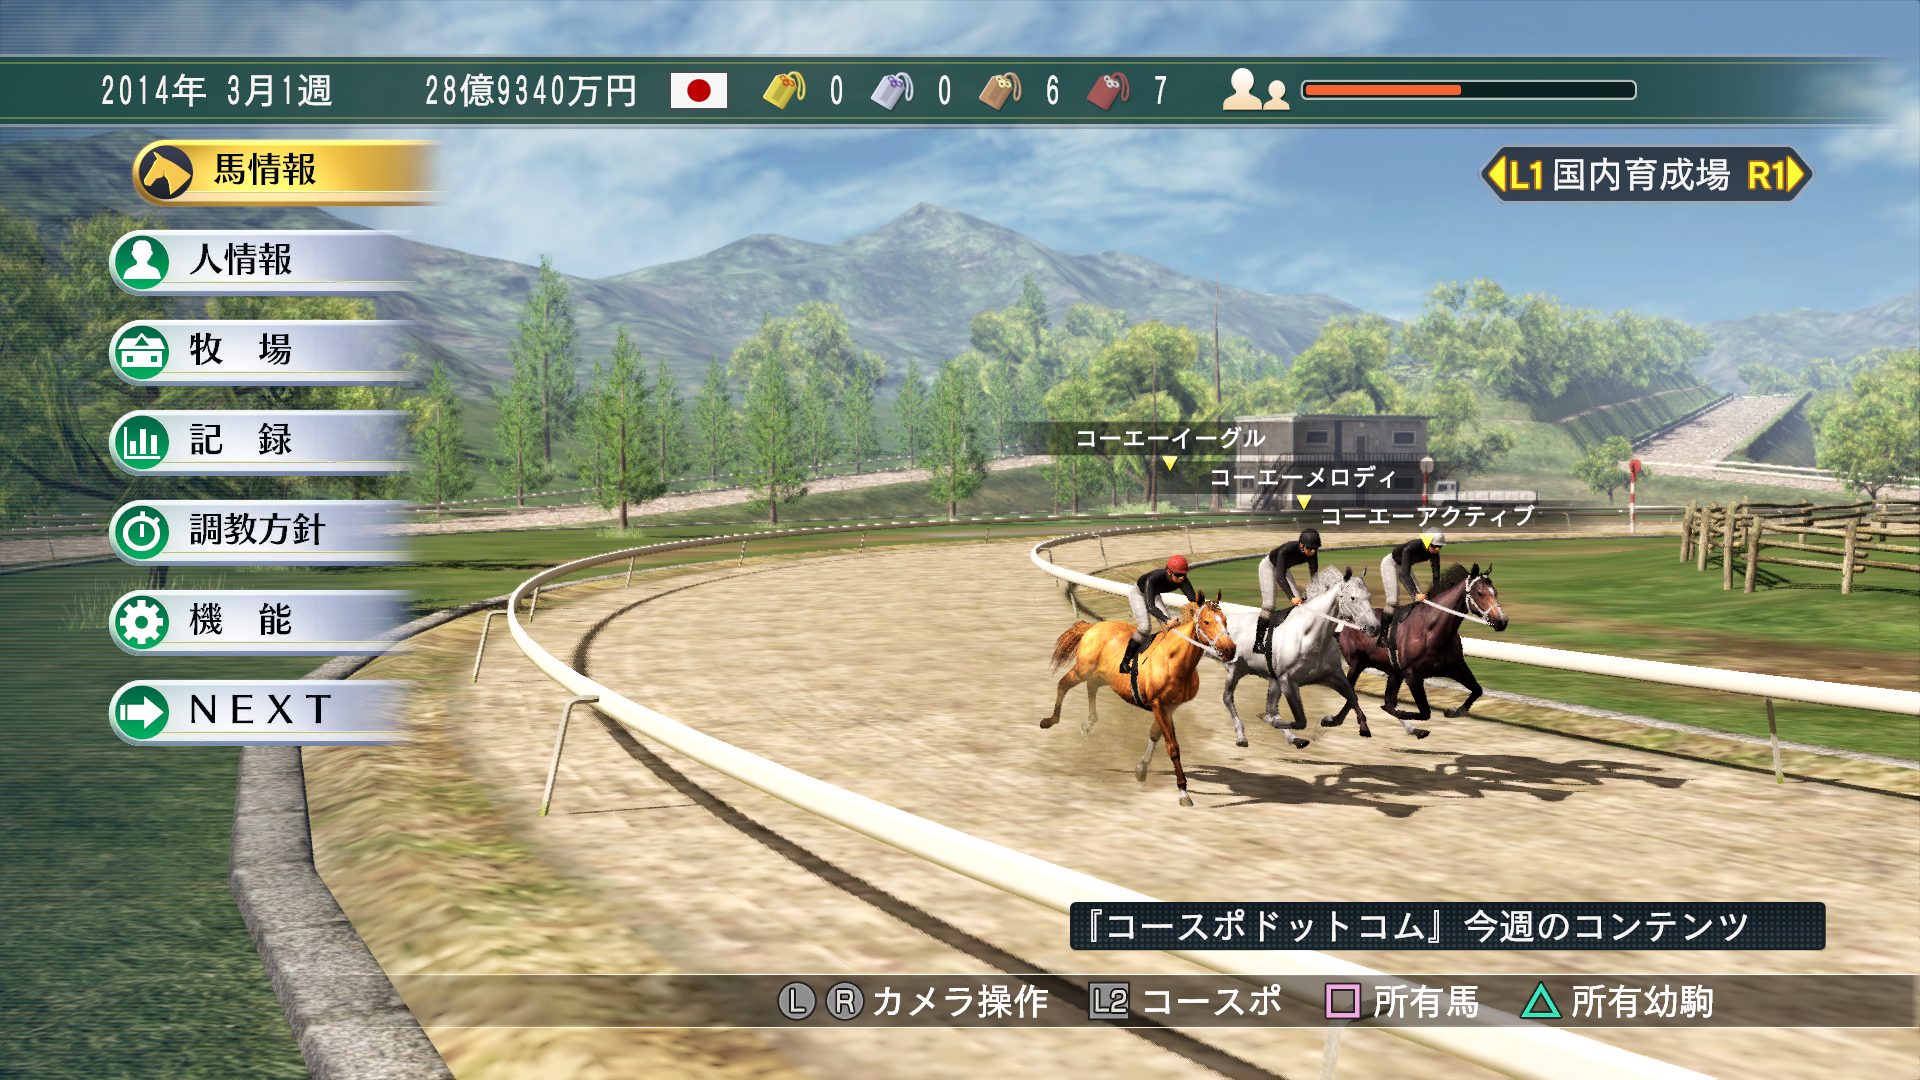 『Winning Post 8 2017』ゲーム画面